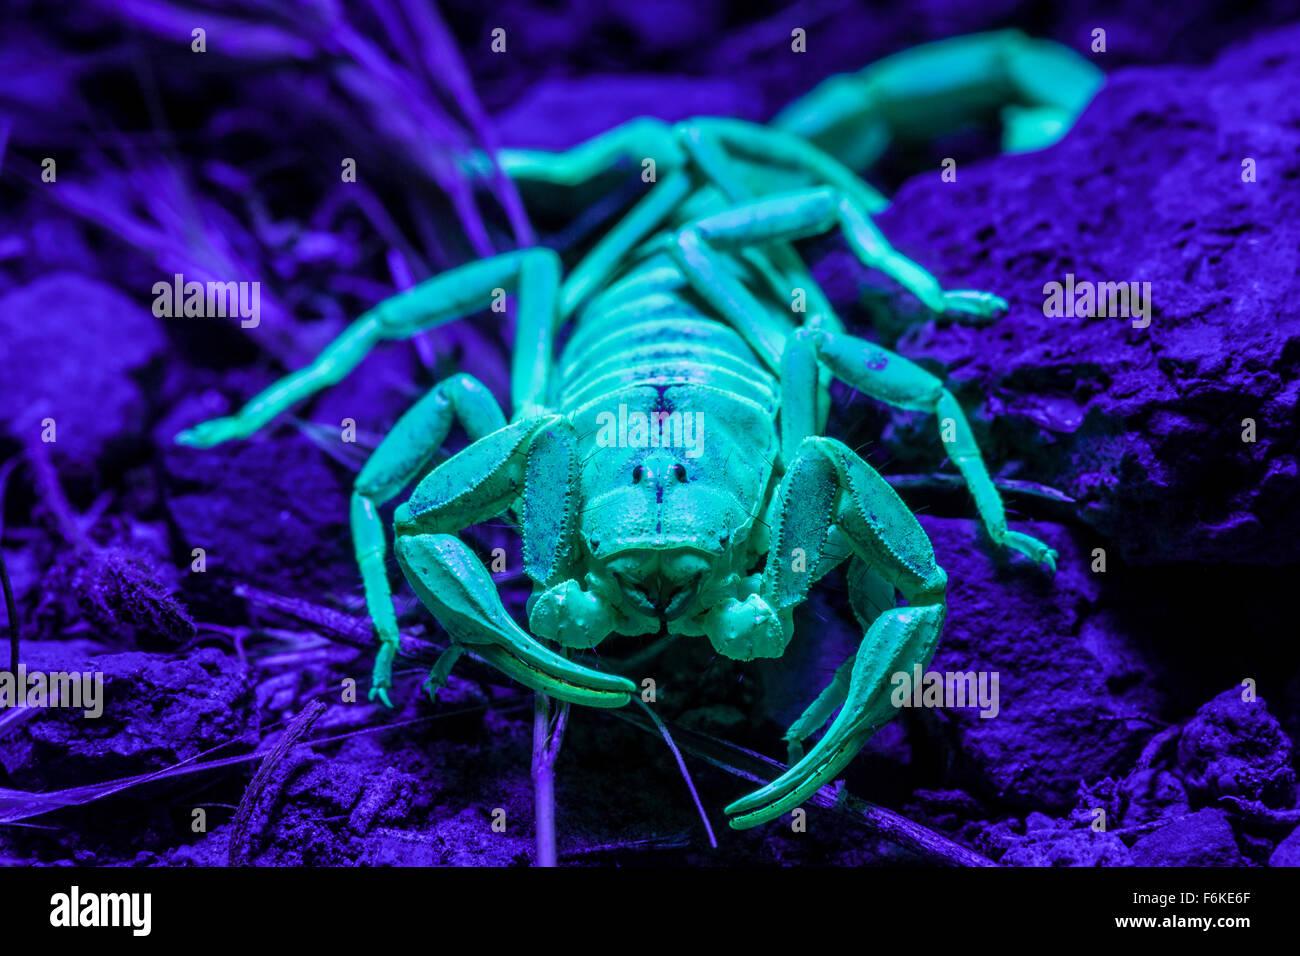 Desert hairy scorpion (Hadrurus spadix) in eastern Oregon, USA, fluorescing under ultraviolet light. - Stock Image